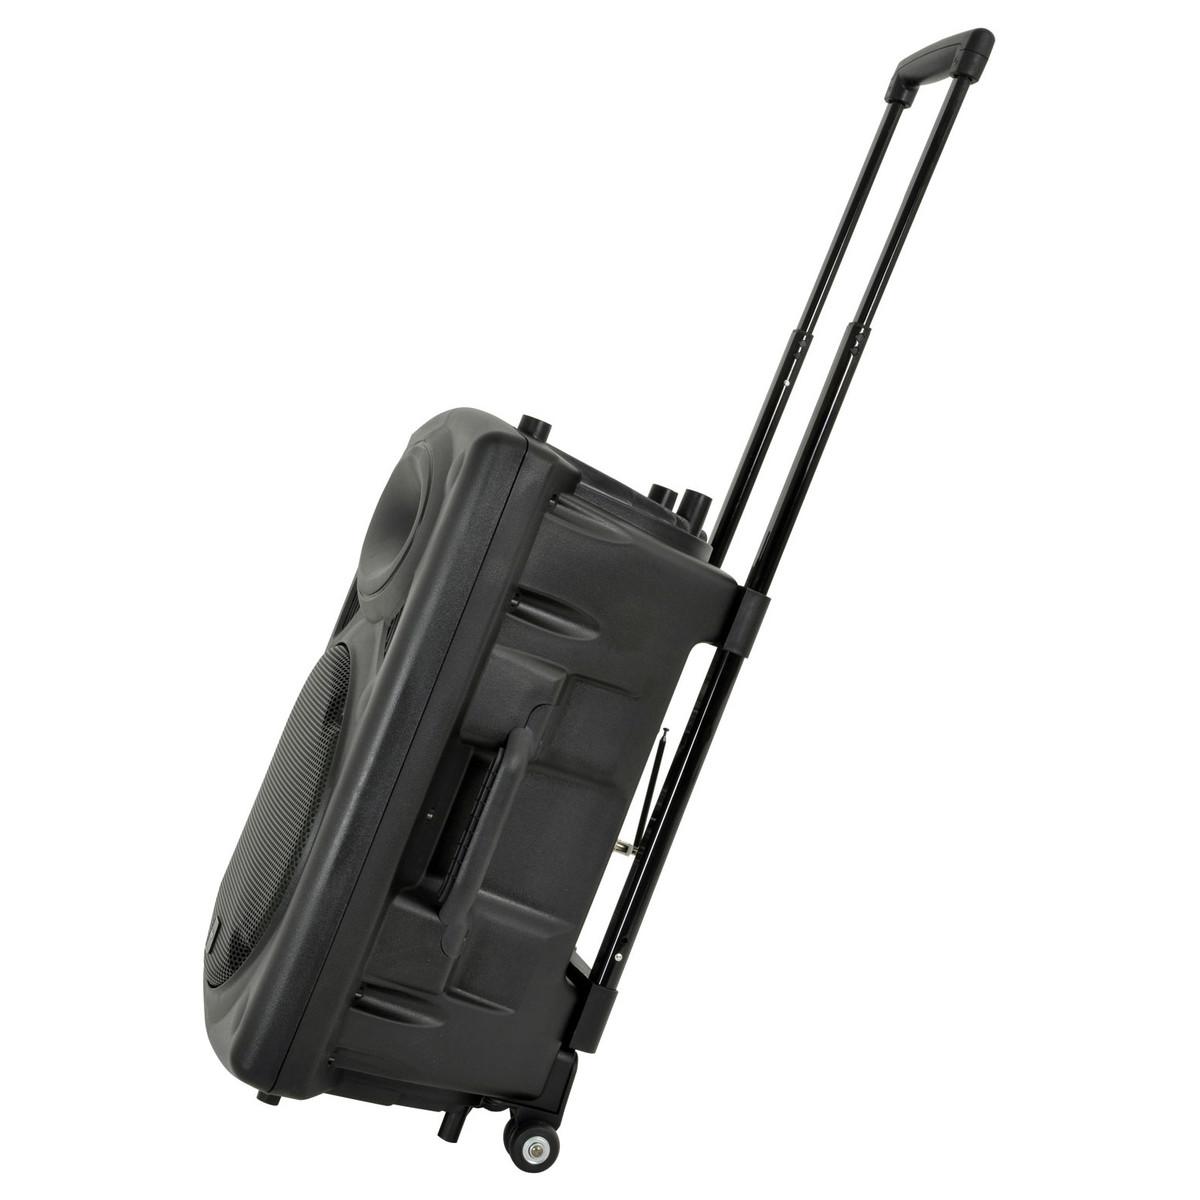 QTX QR12PA Portable PA System with Wireless Mics